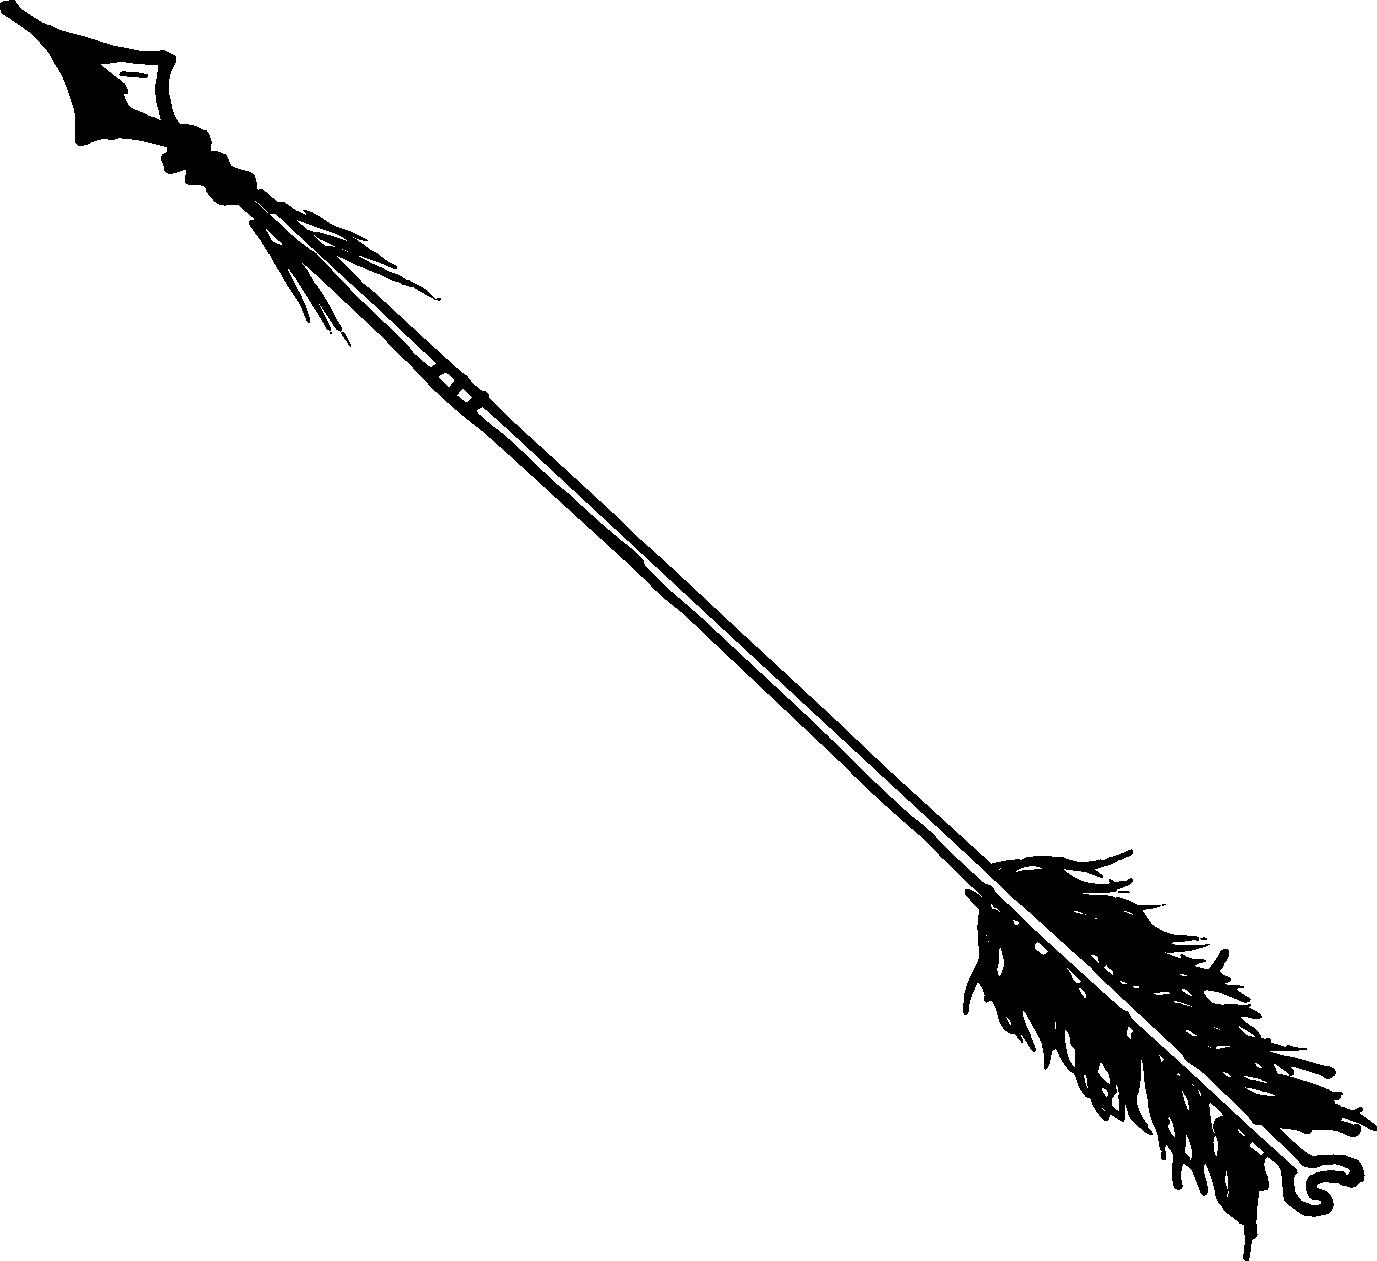 10 Bow Arrow Vector (SVG, PNG Transparent) | OnlyGFX.com